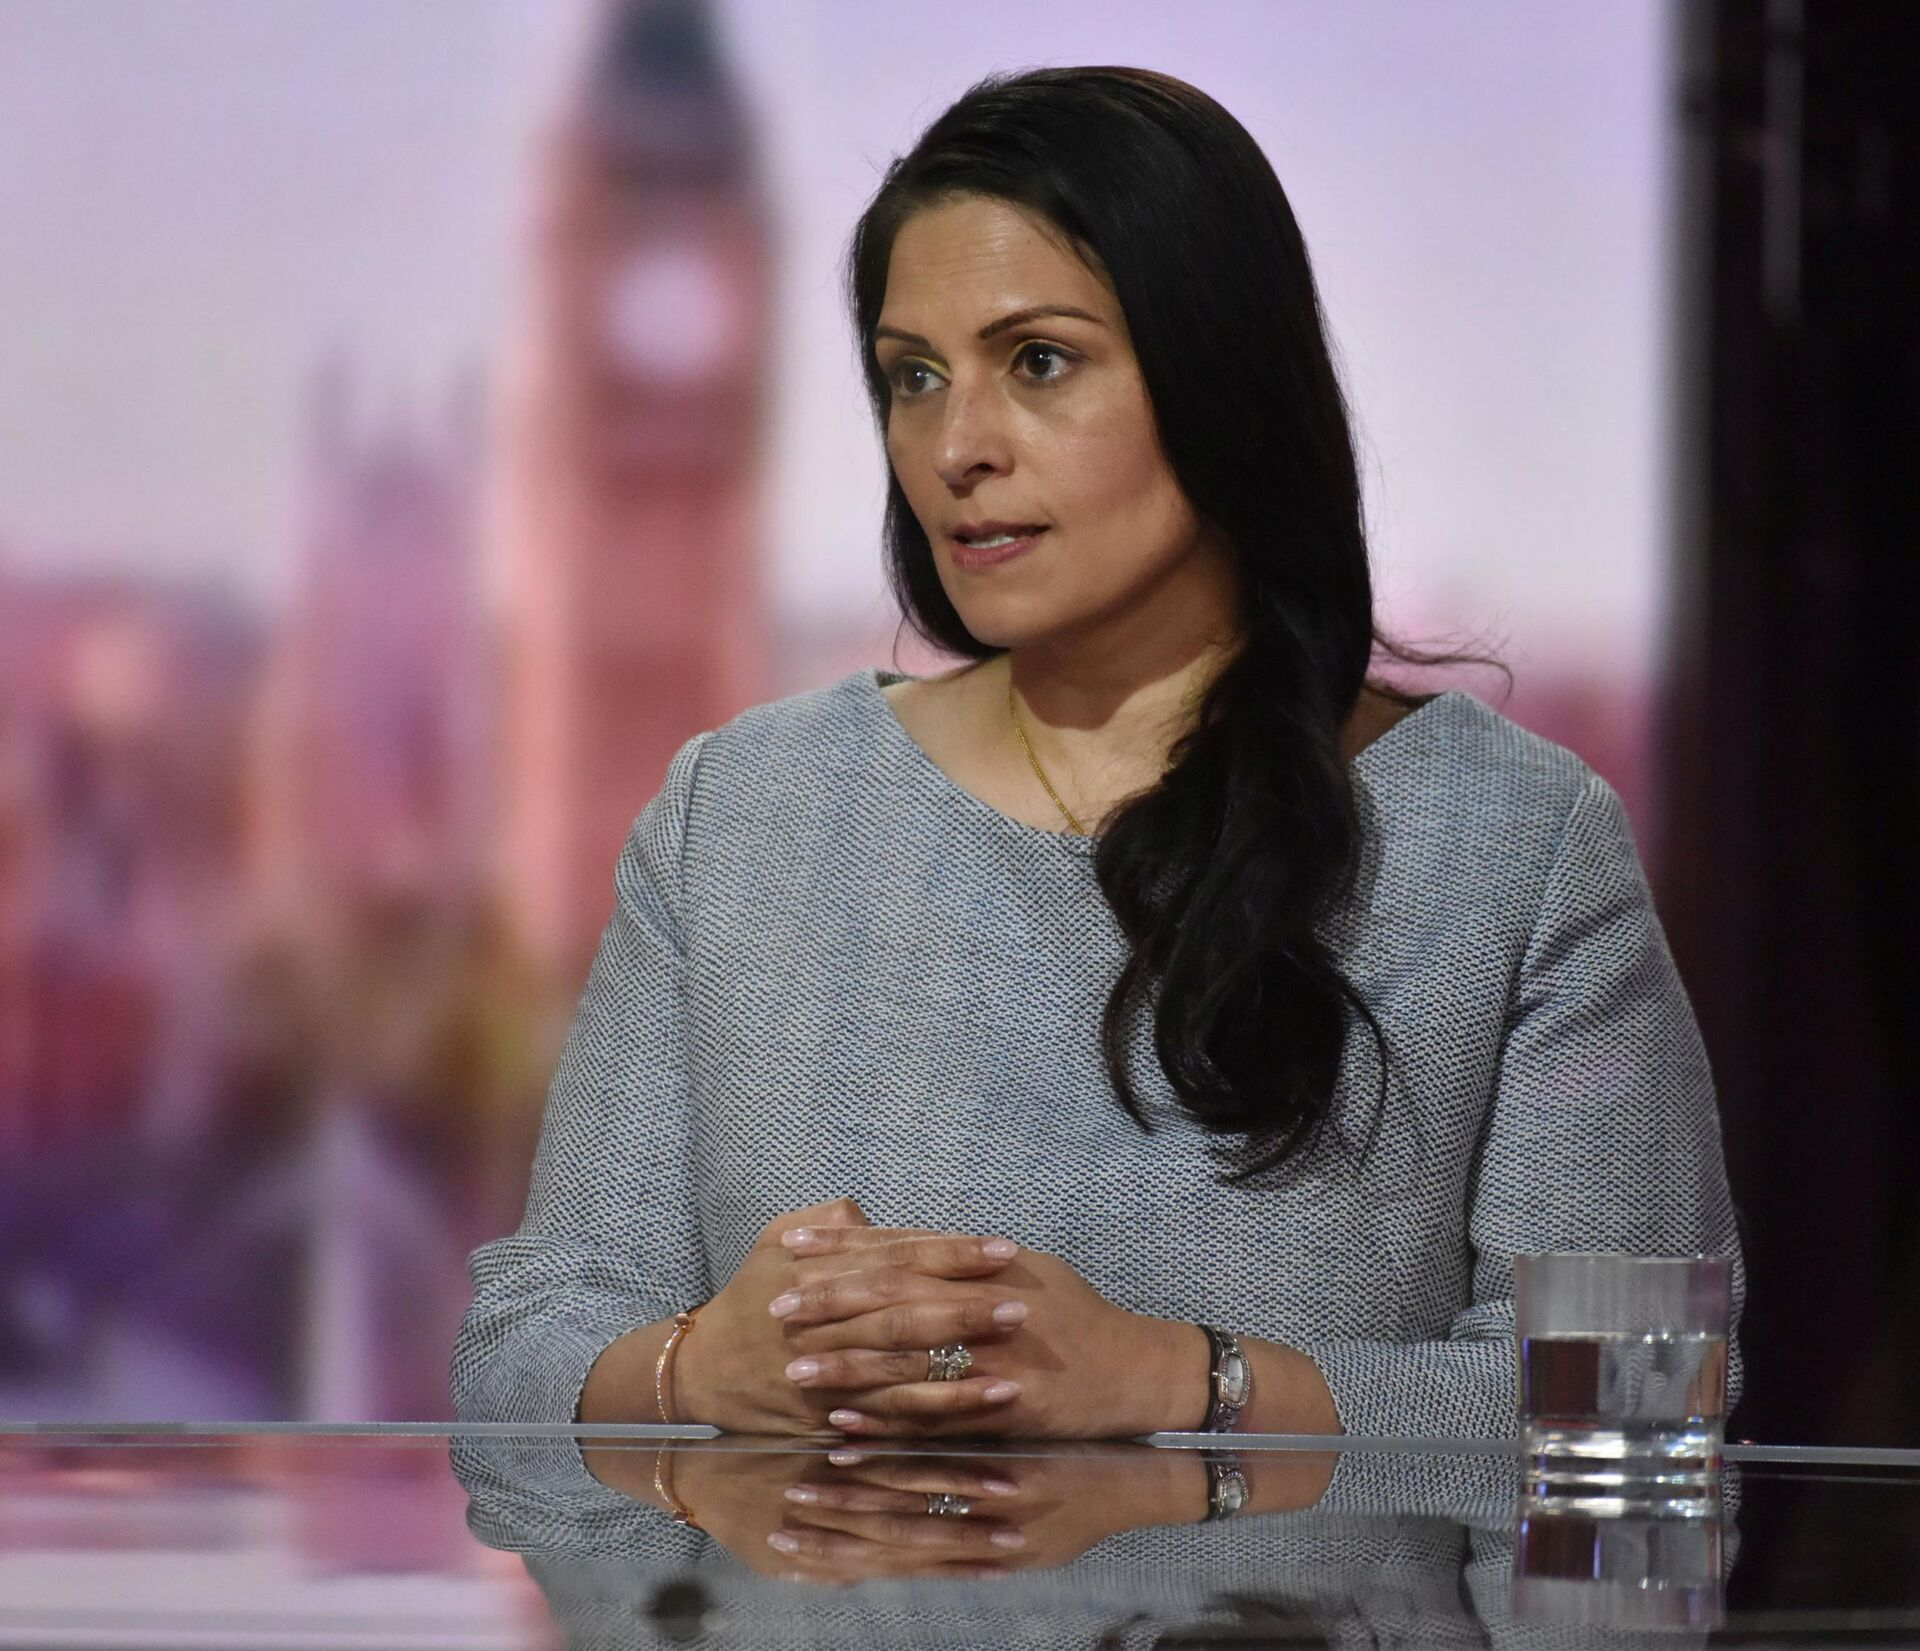 Britain's Home Secretary Priti Patel appears on BBC TV's The Andrew Marr Show in London, Britain May 23, 2021 - Sputnik International, 1920, 07.09.2021